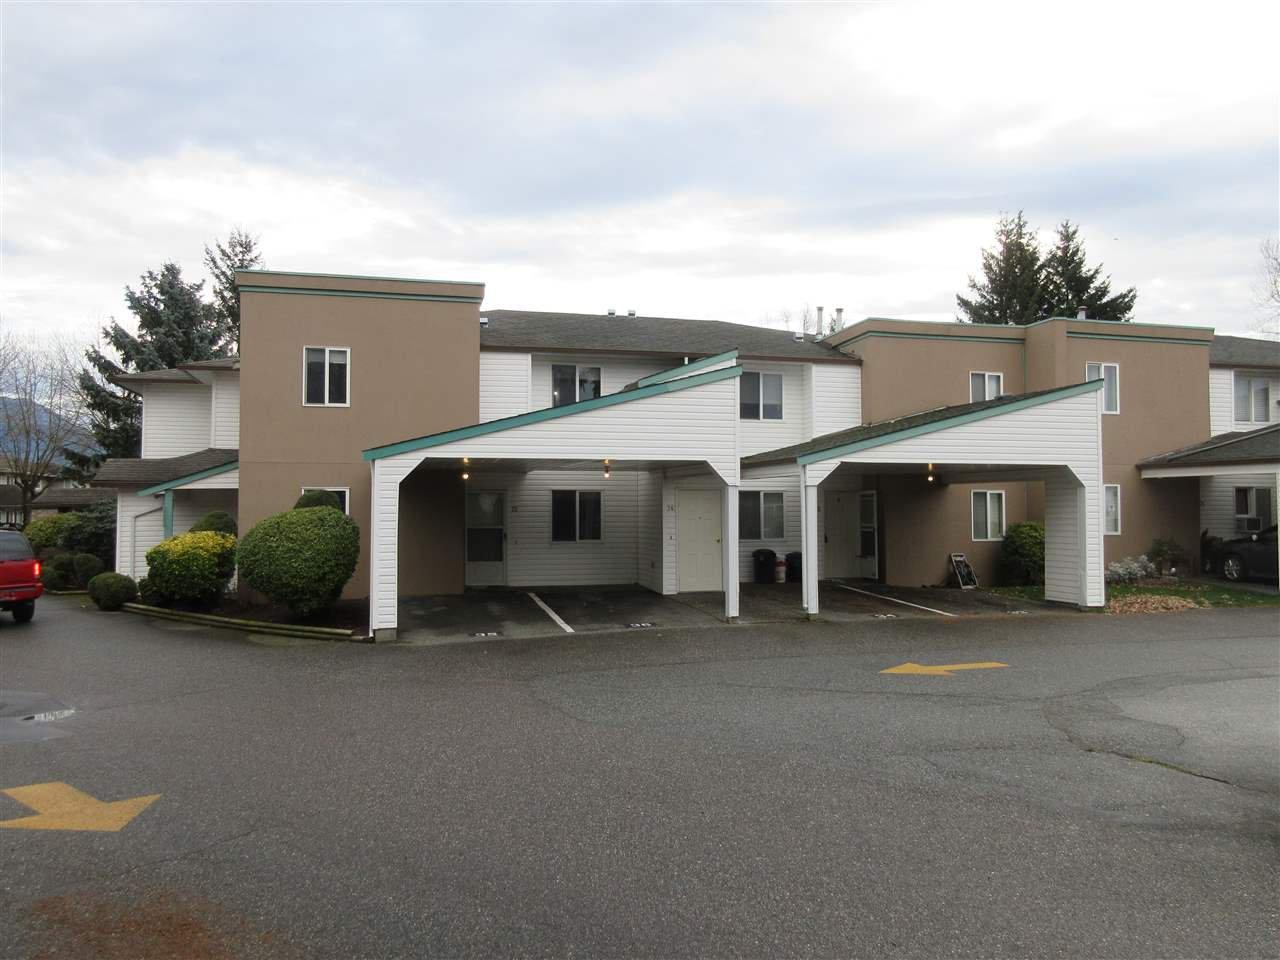 "Main Photo: 33 7715 LUCKAKUCK Place in Sardis: Sardis West Vedder Rd Townhouse for sale in ""VILLAGE CREEK ESTATES"" : MLS®# R2423743"